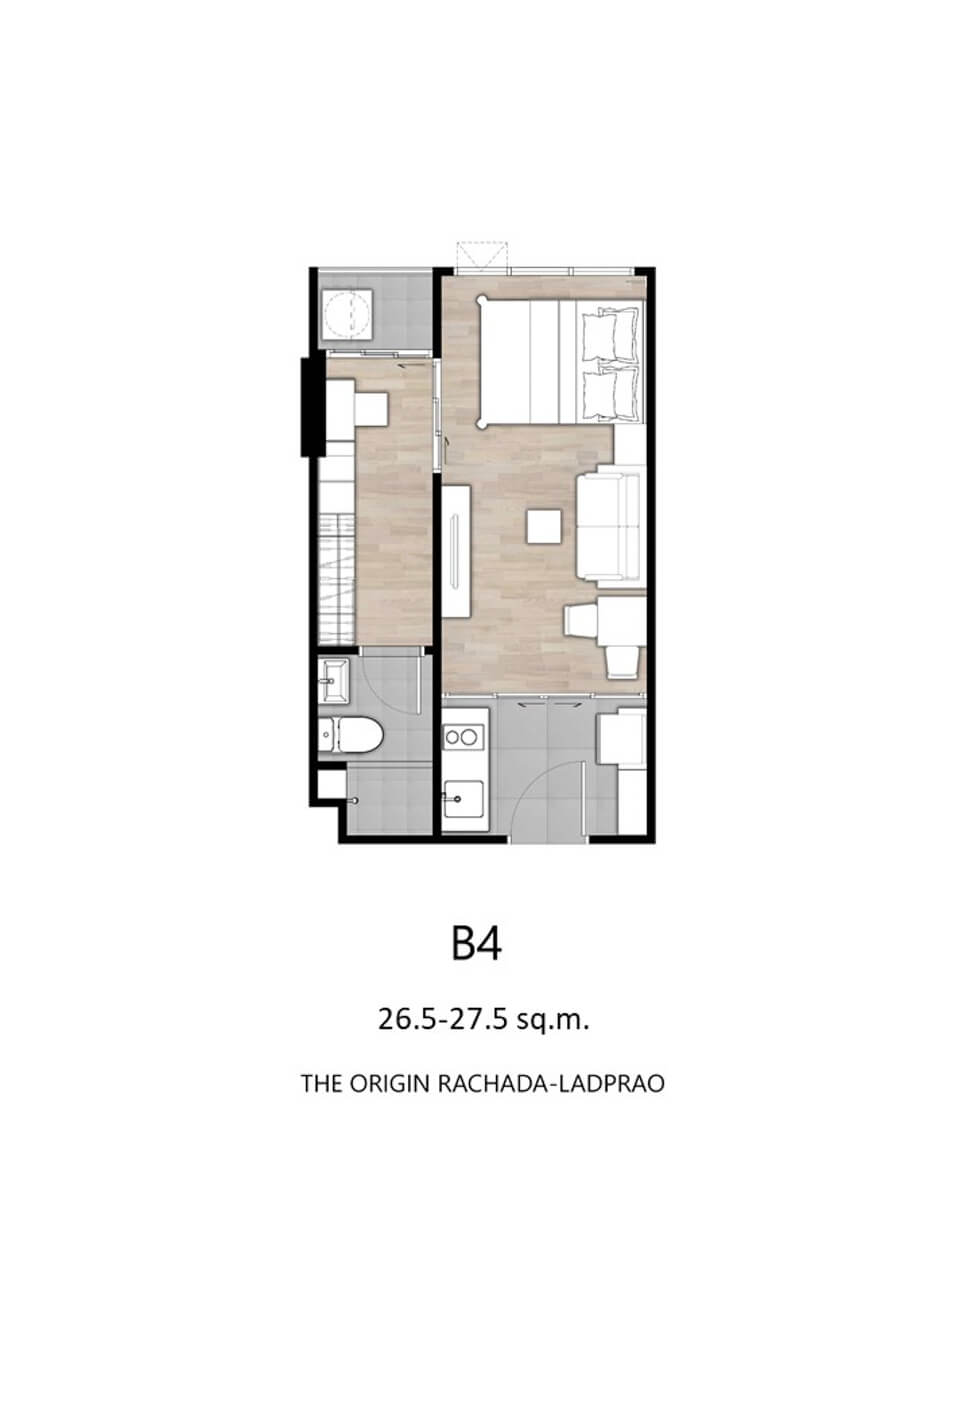 Review The Origin Ratchada Ladprao E.1 12